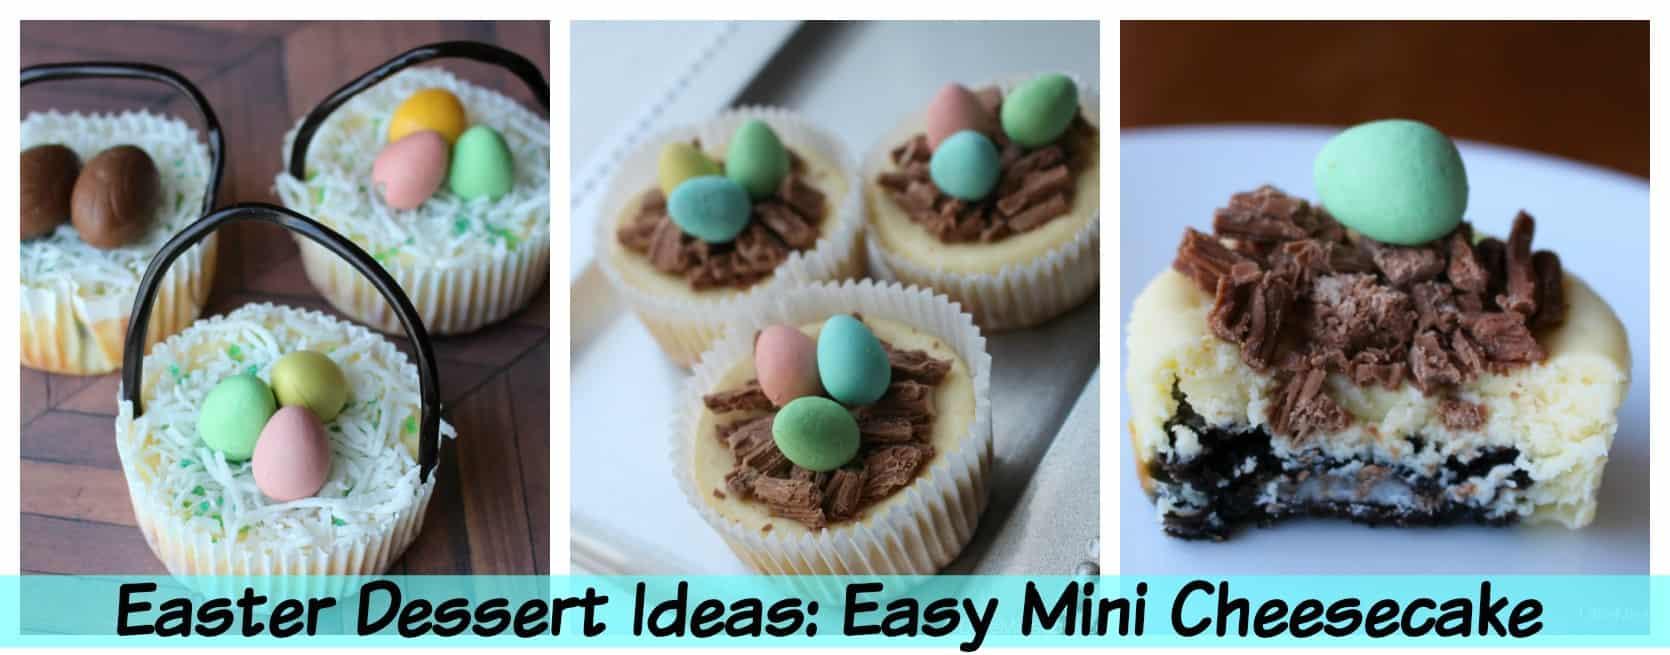 Easter Dessert Ideas: Easy Mini Individual Cheesecake Recipe